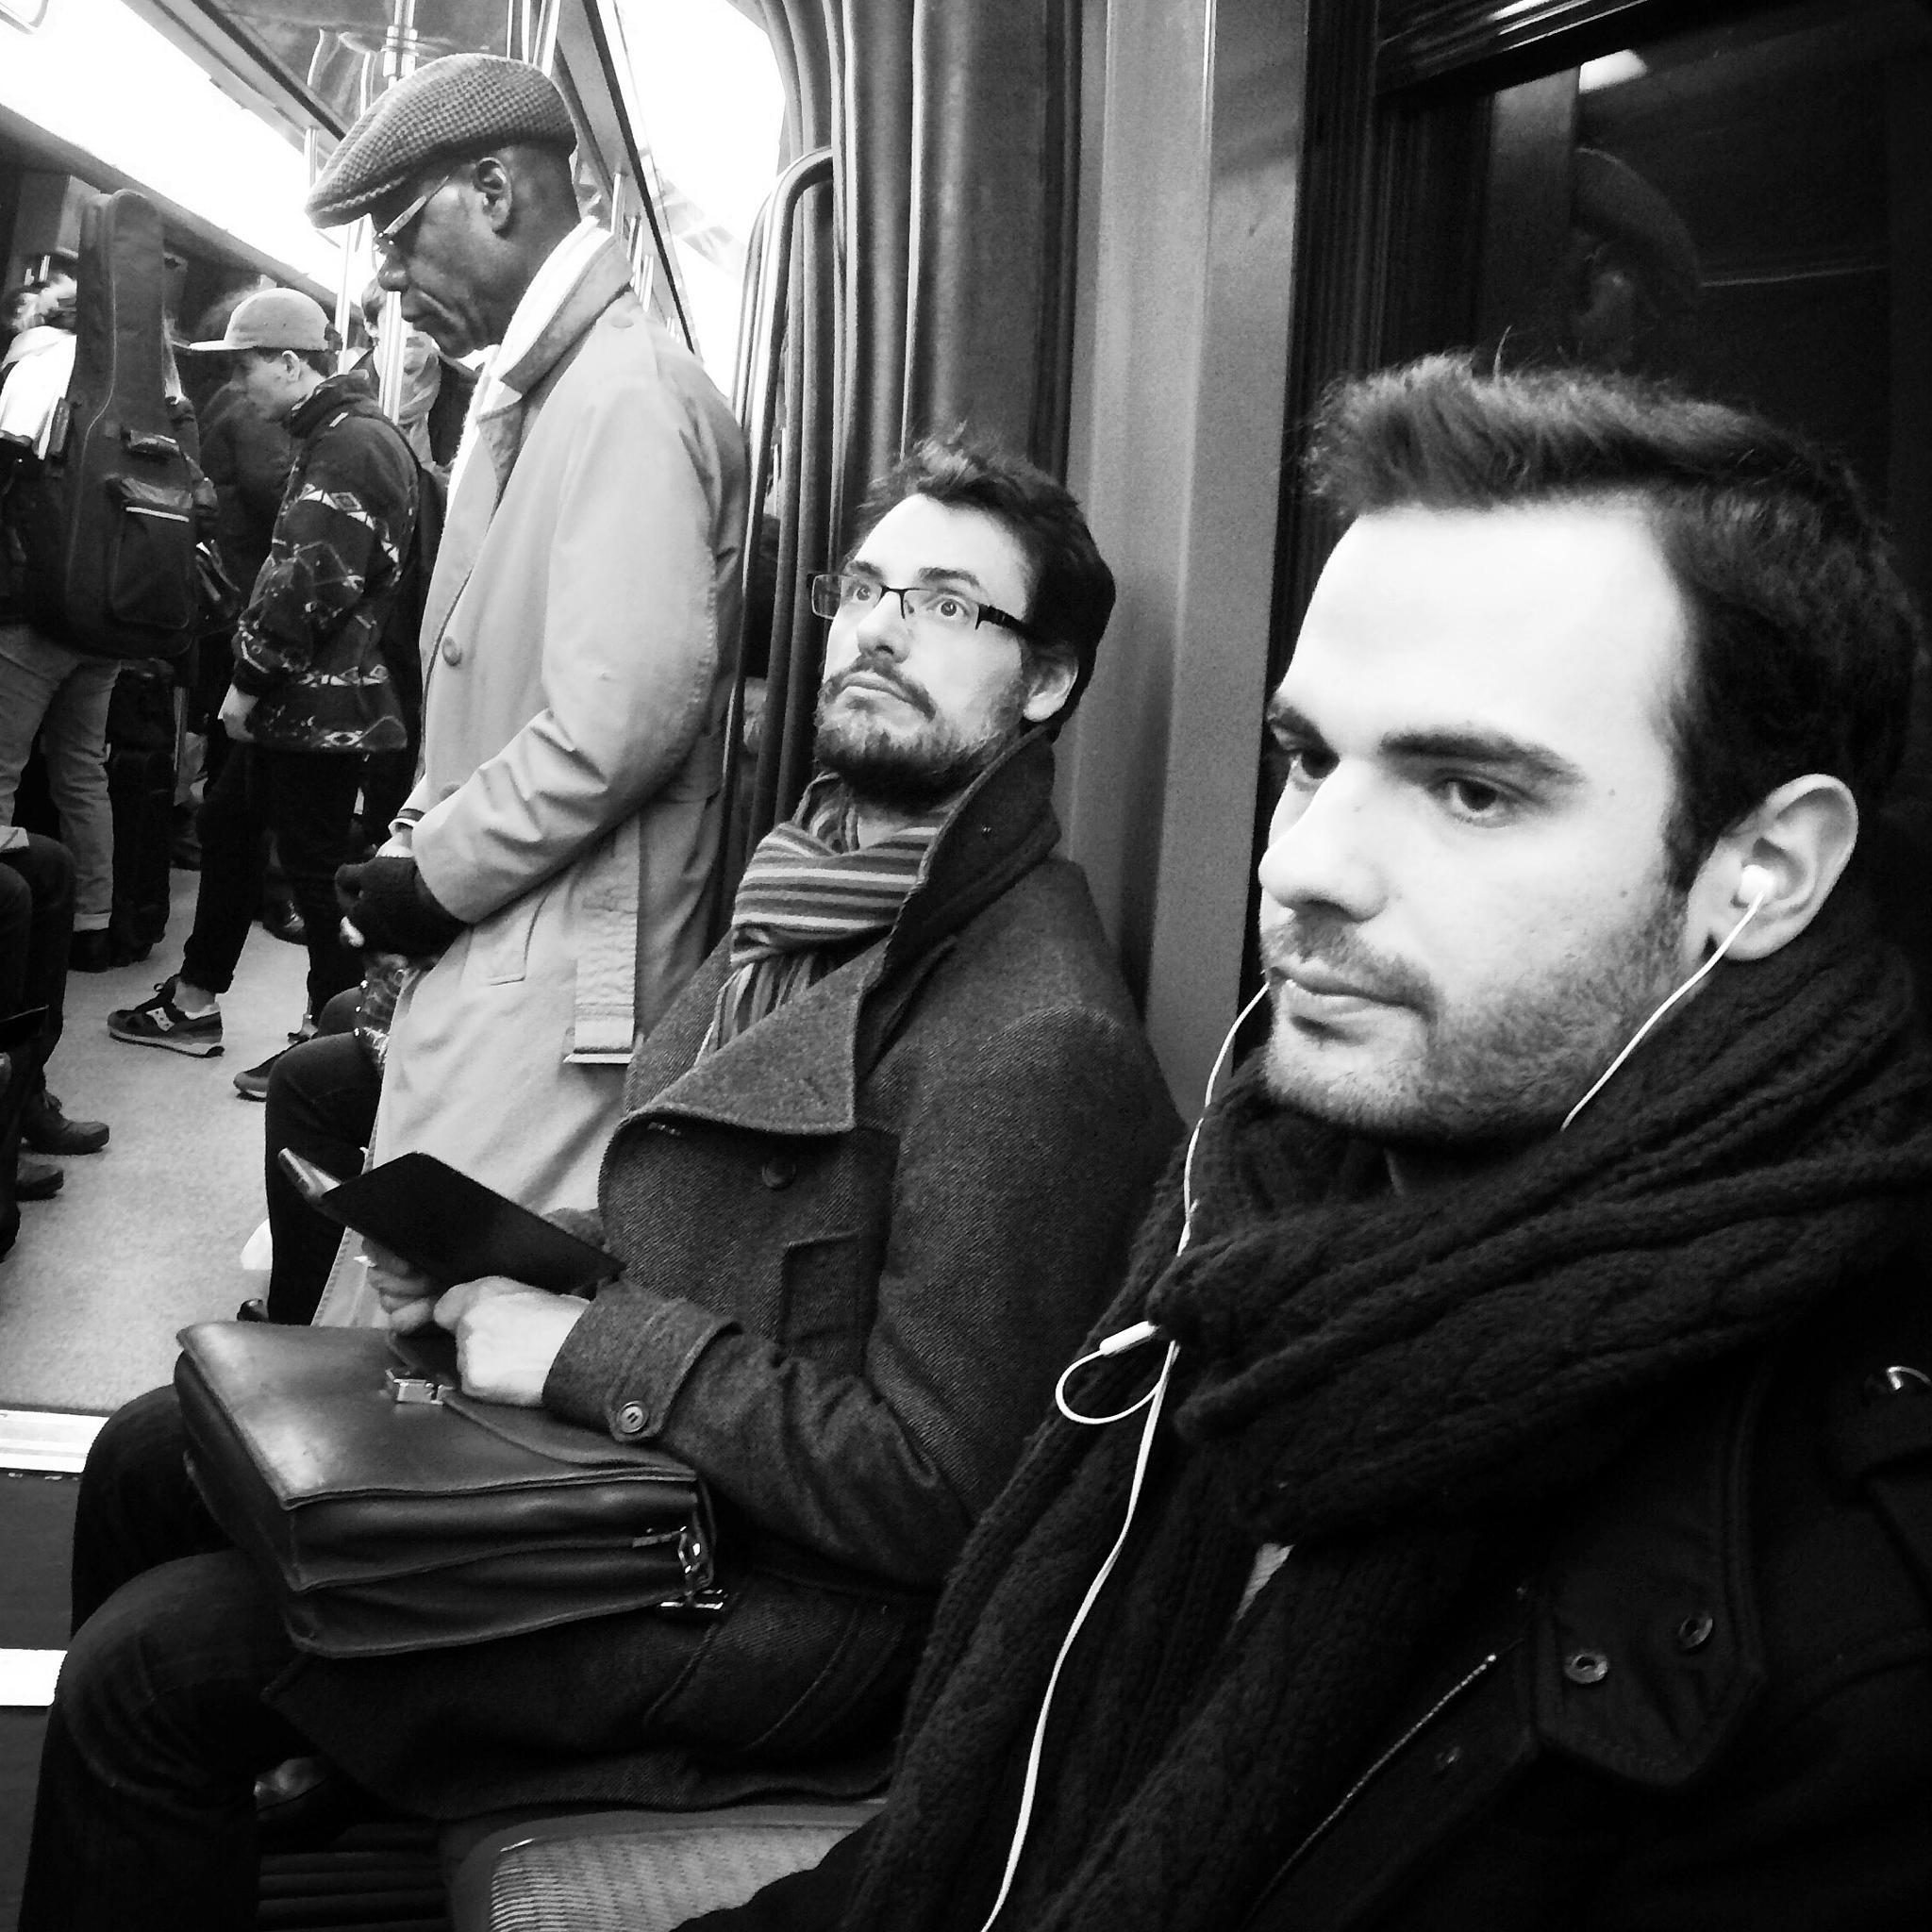 Metro portraits by parisfind